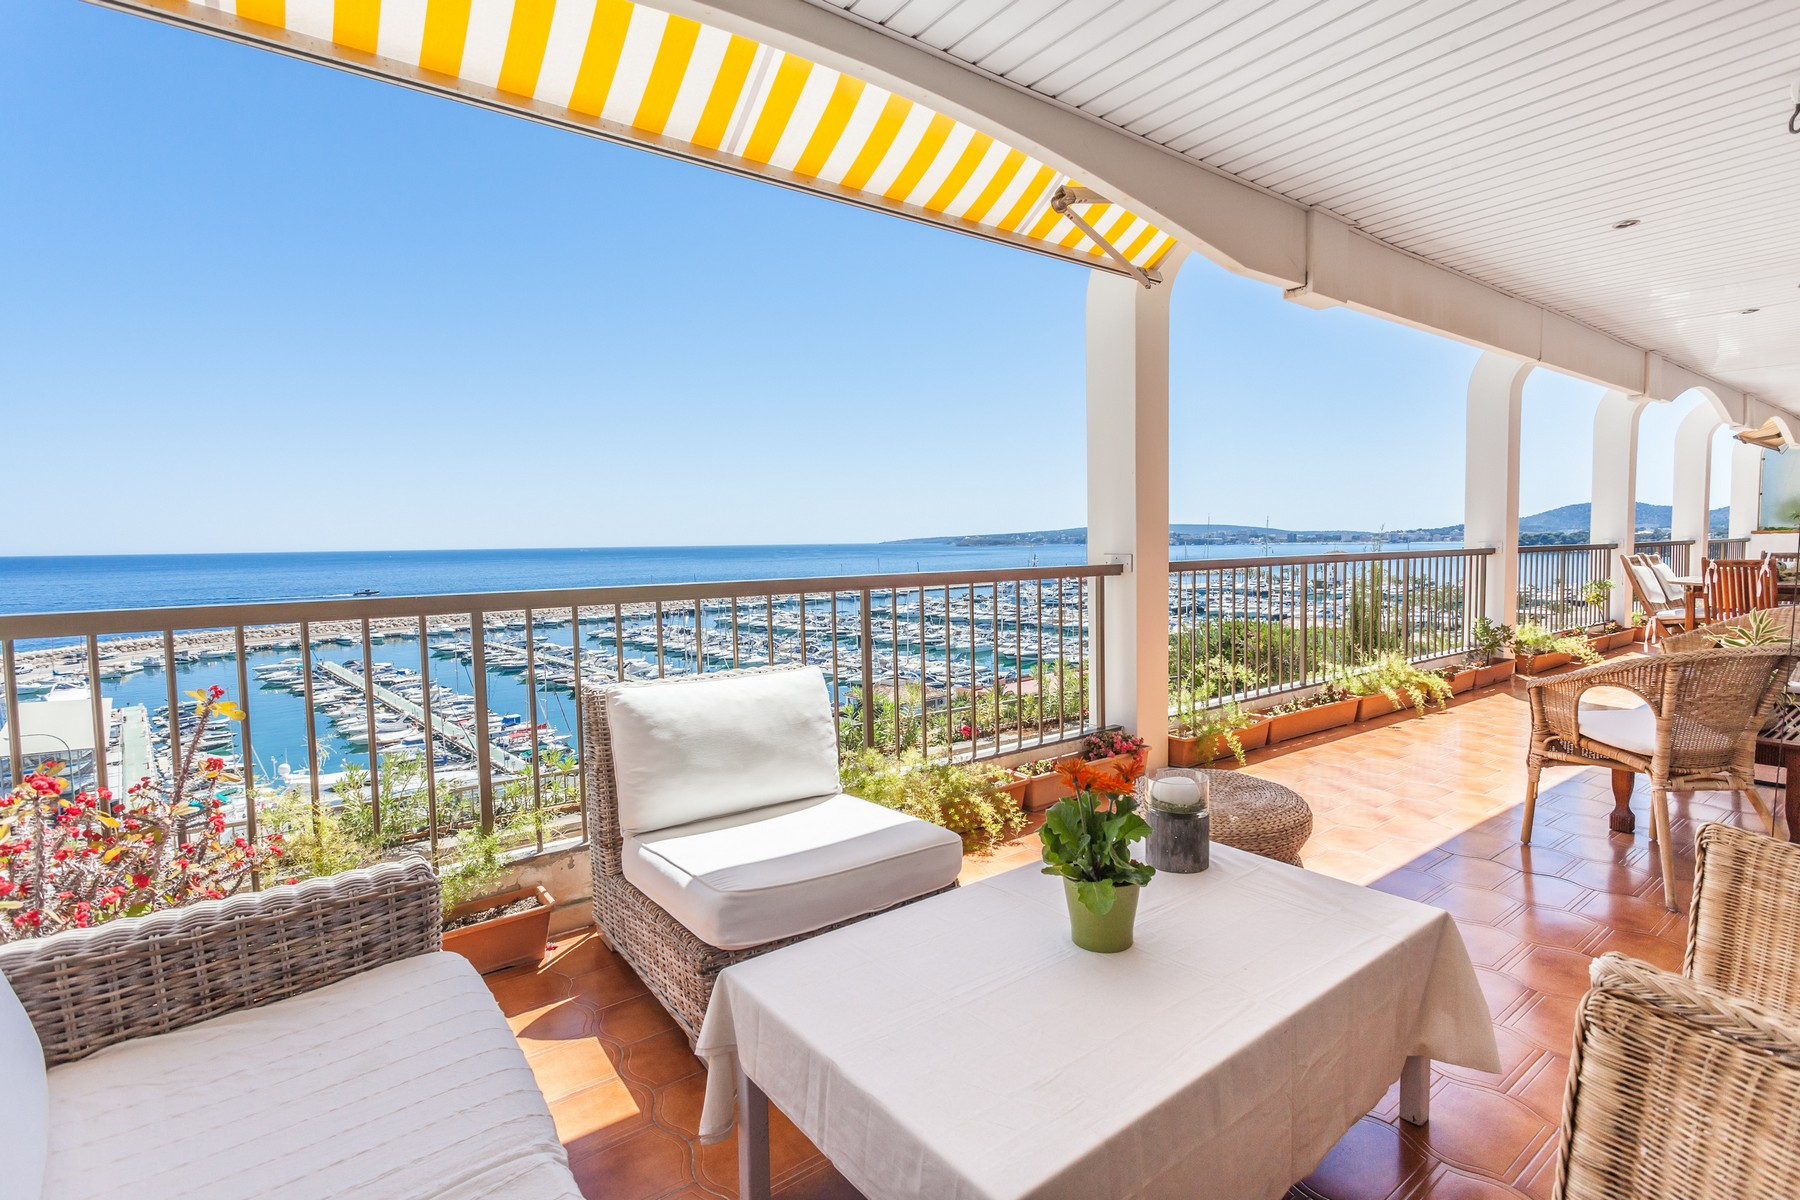 Apartamento por un Venta en Luxury apartment overlooking Puerto Portals Marina Portals, Mallorca, 07181 España